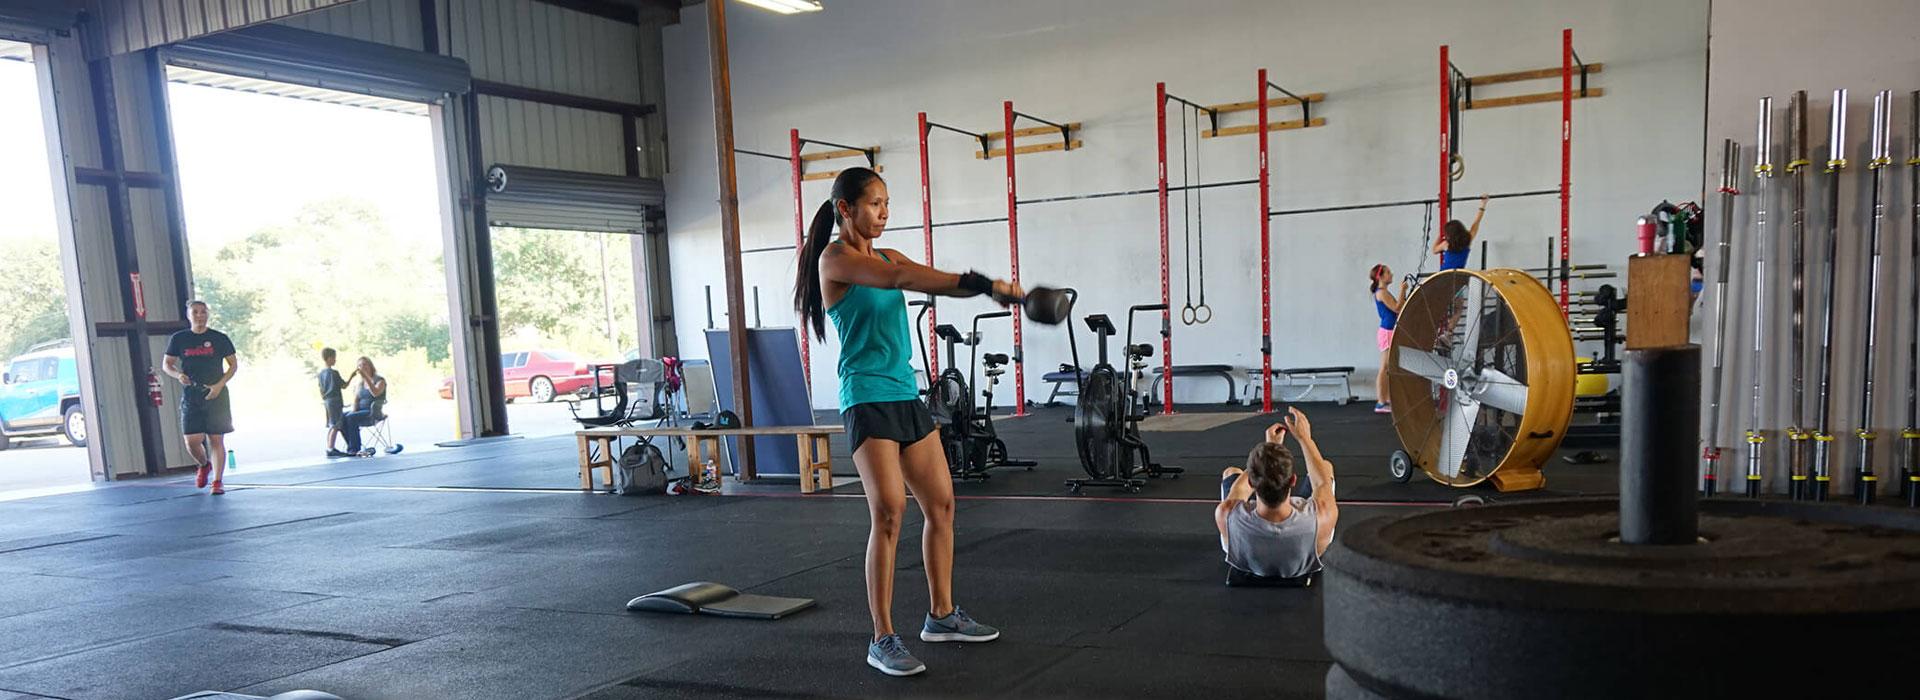 Workout in Cypress TX, Workout near Northwest Houston TX, Workout near Houston TX